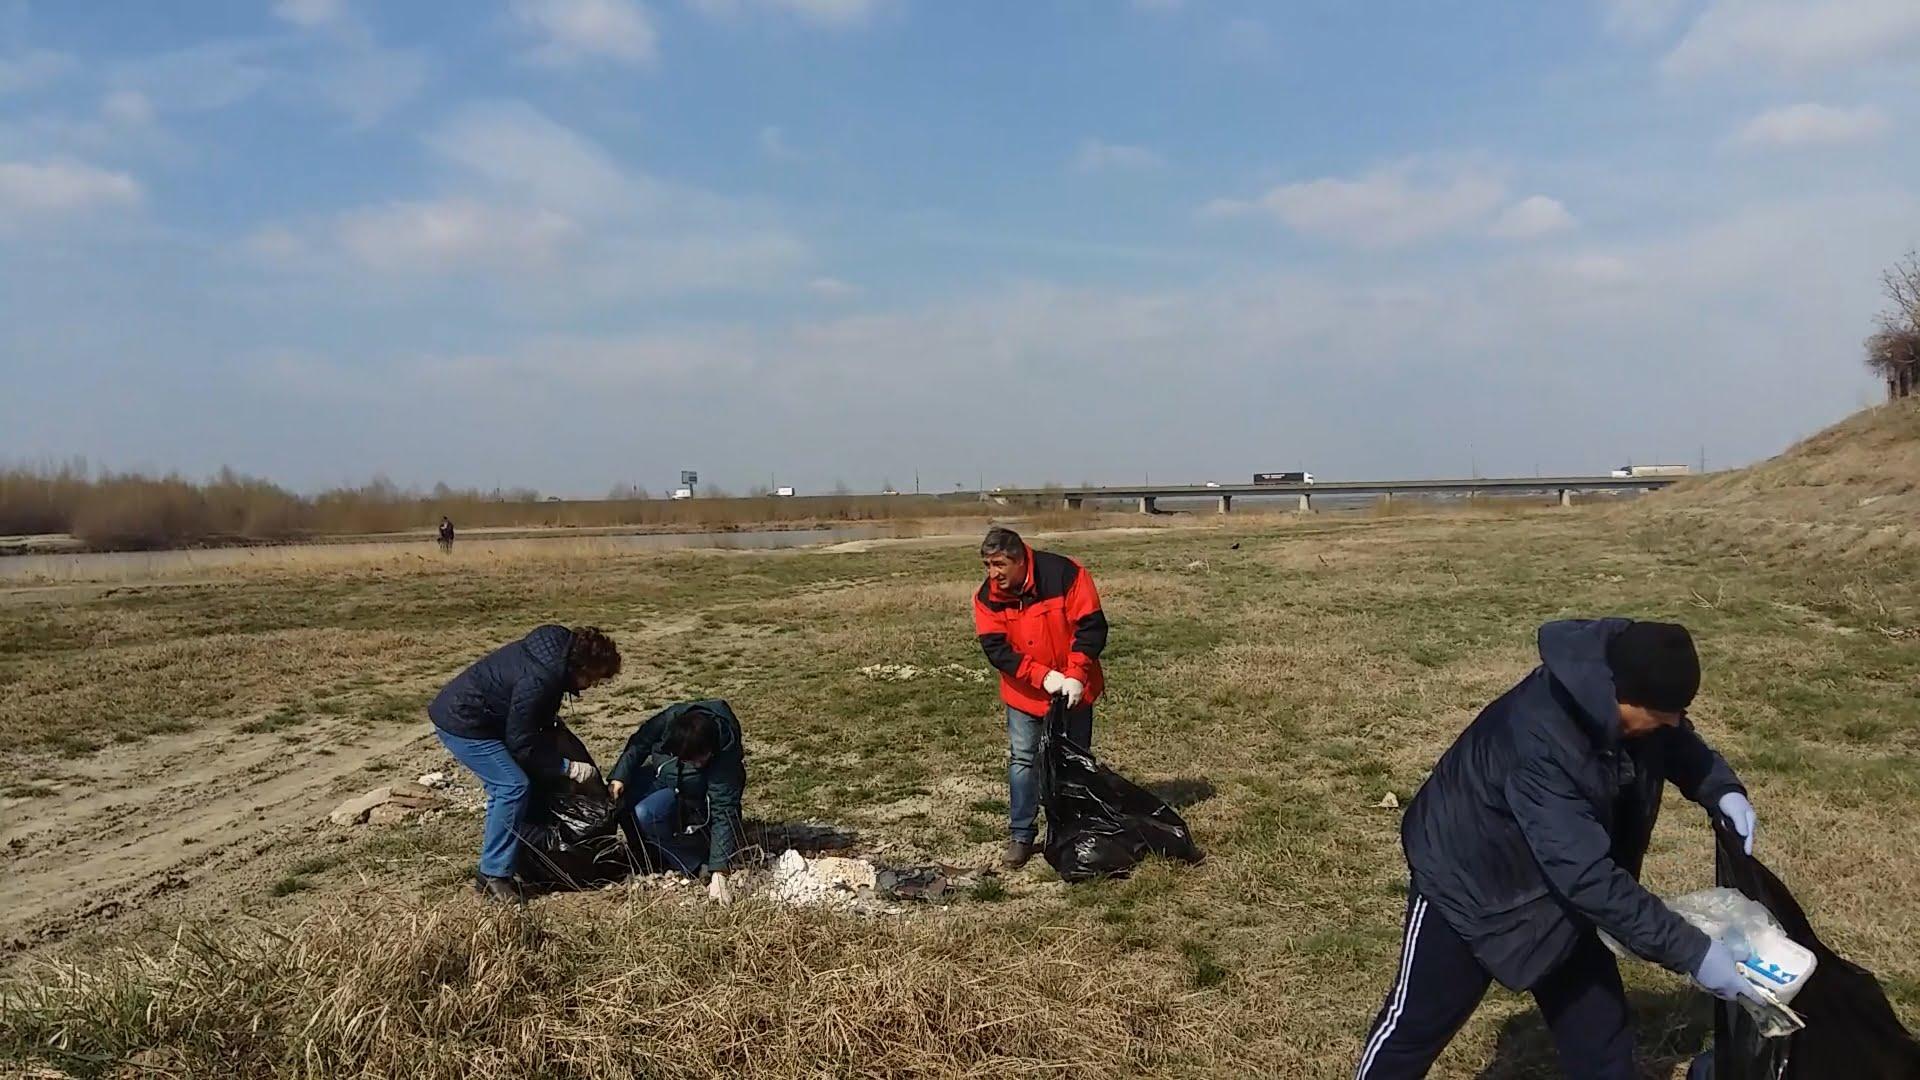 Acțiune de ecologizare a PSD Roman, de Ziua Mondială a Apei